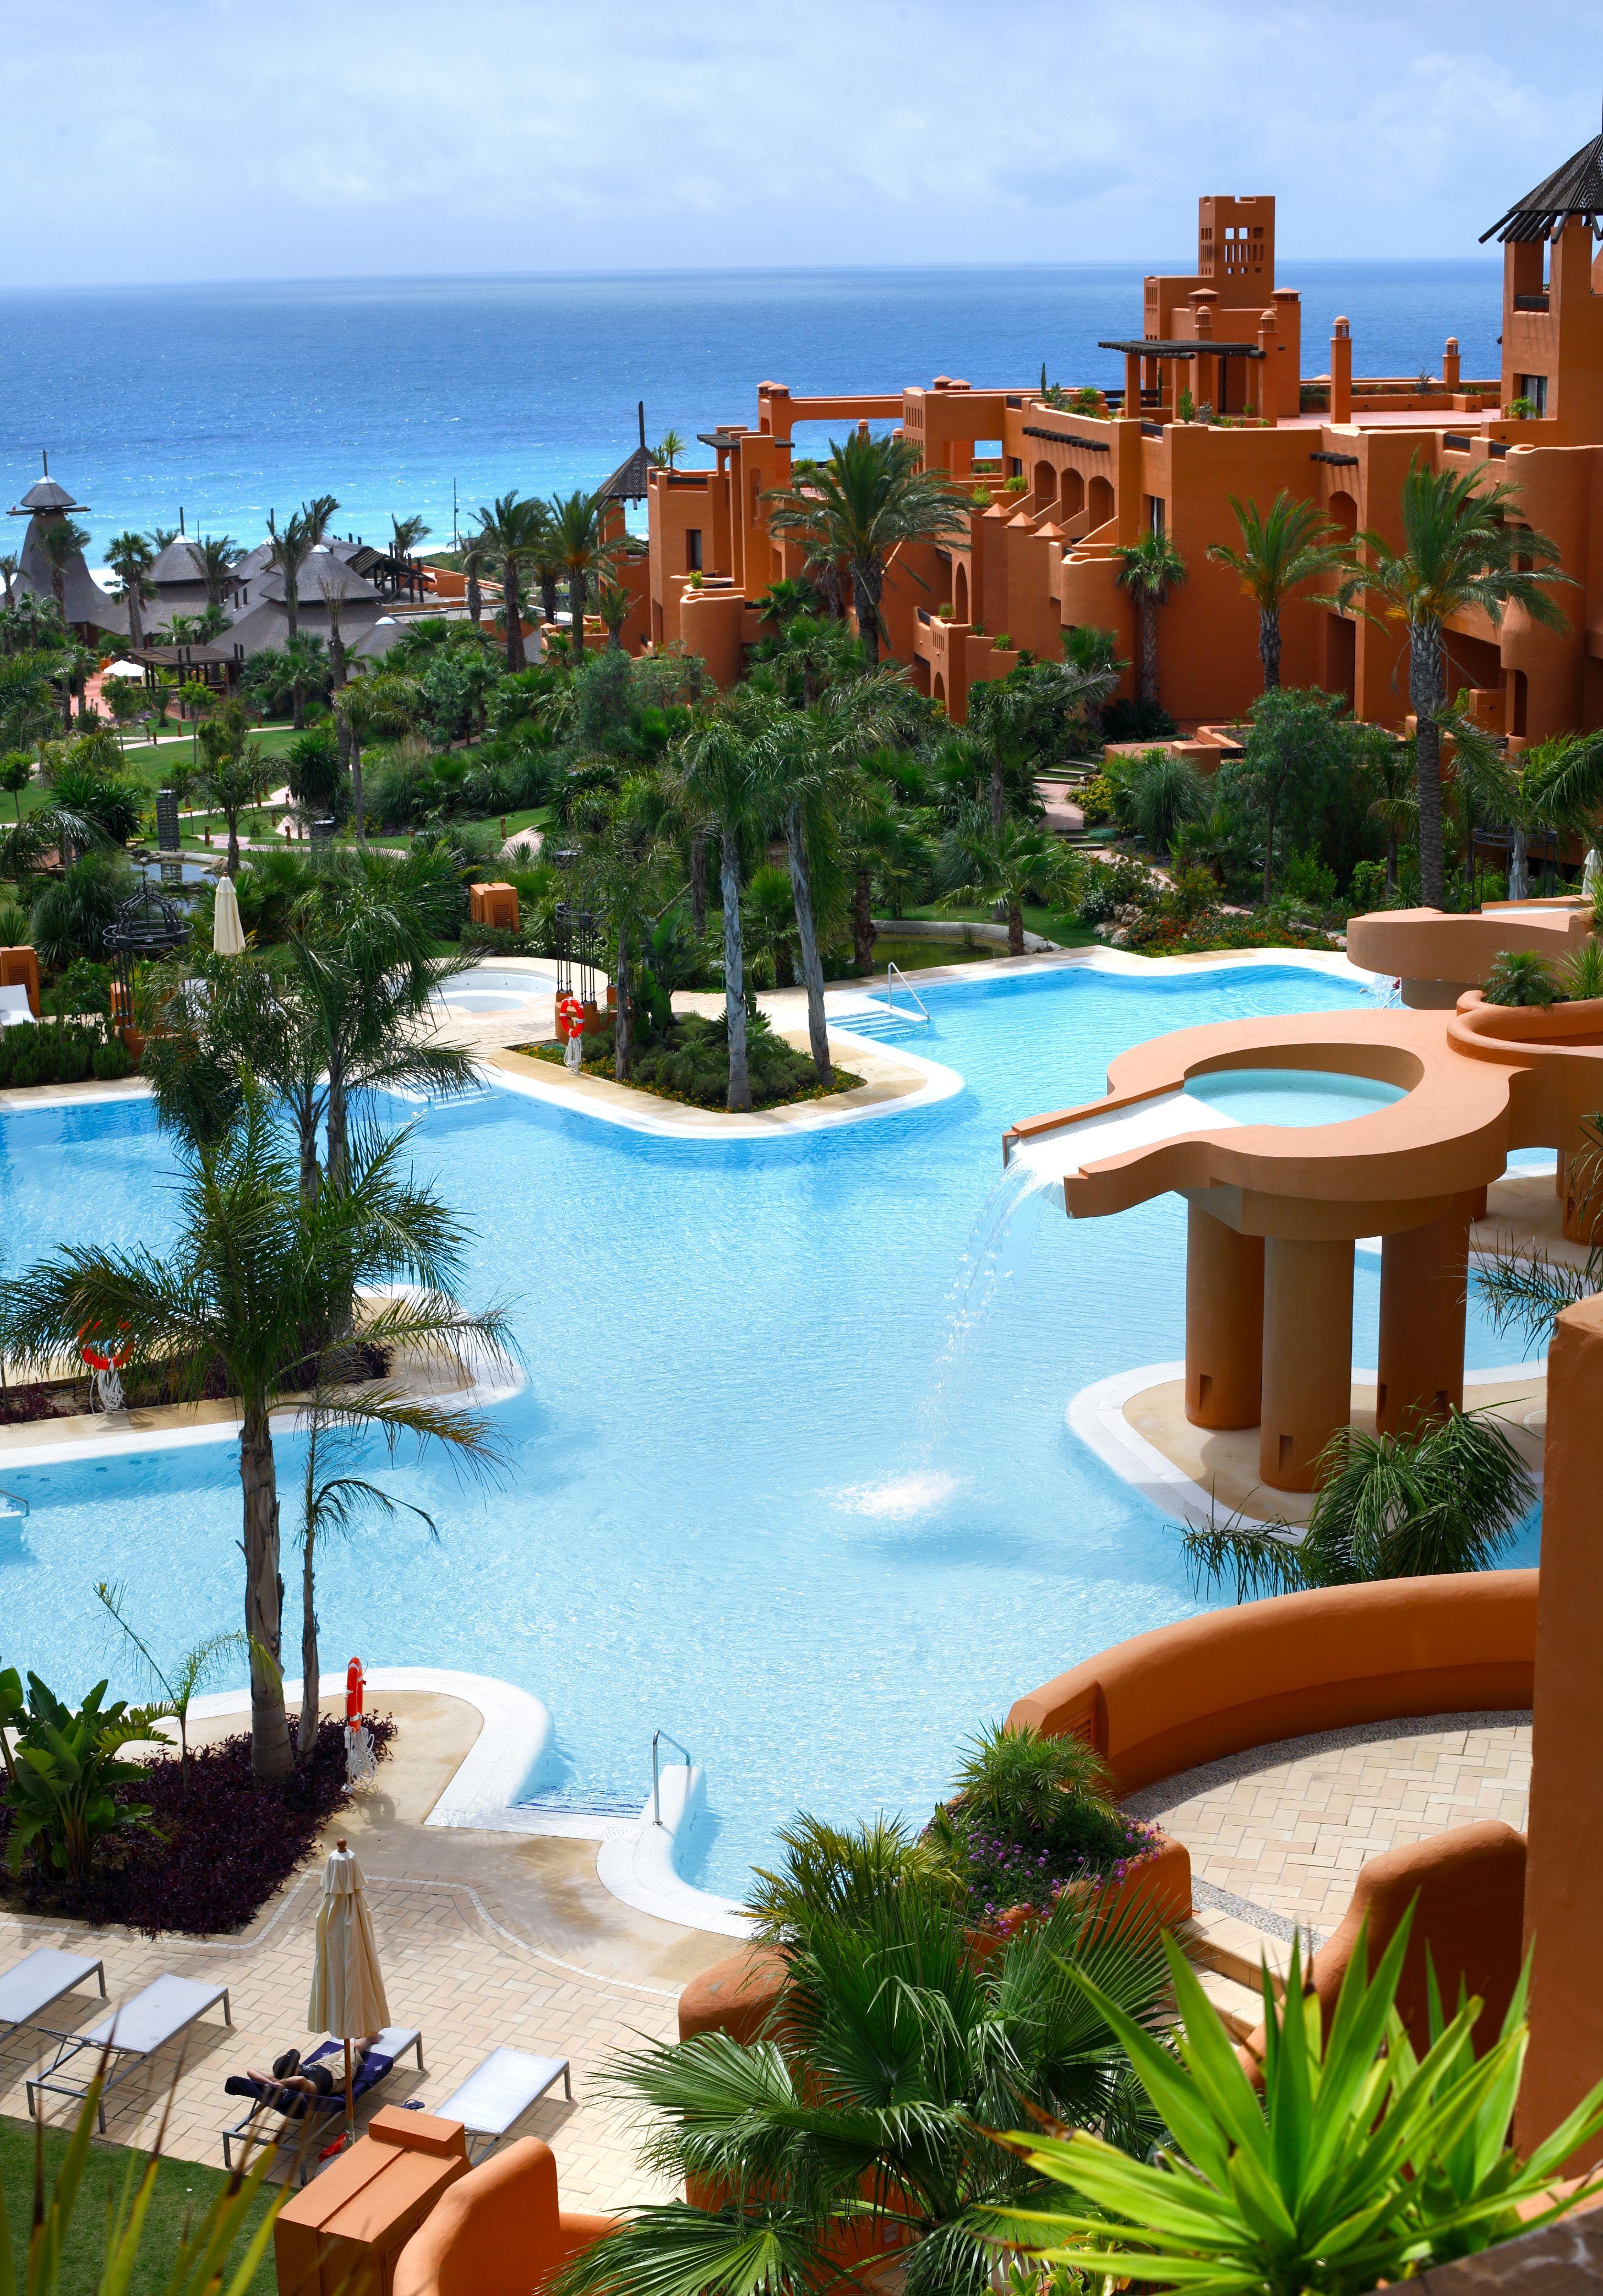 Hotel Barcelo Sancti Petri, Chiclana De La Frontera, Cadiz